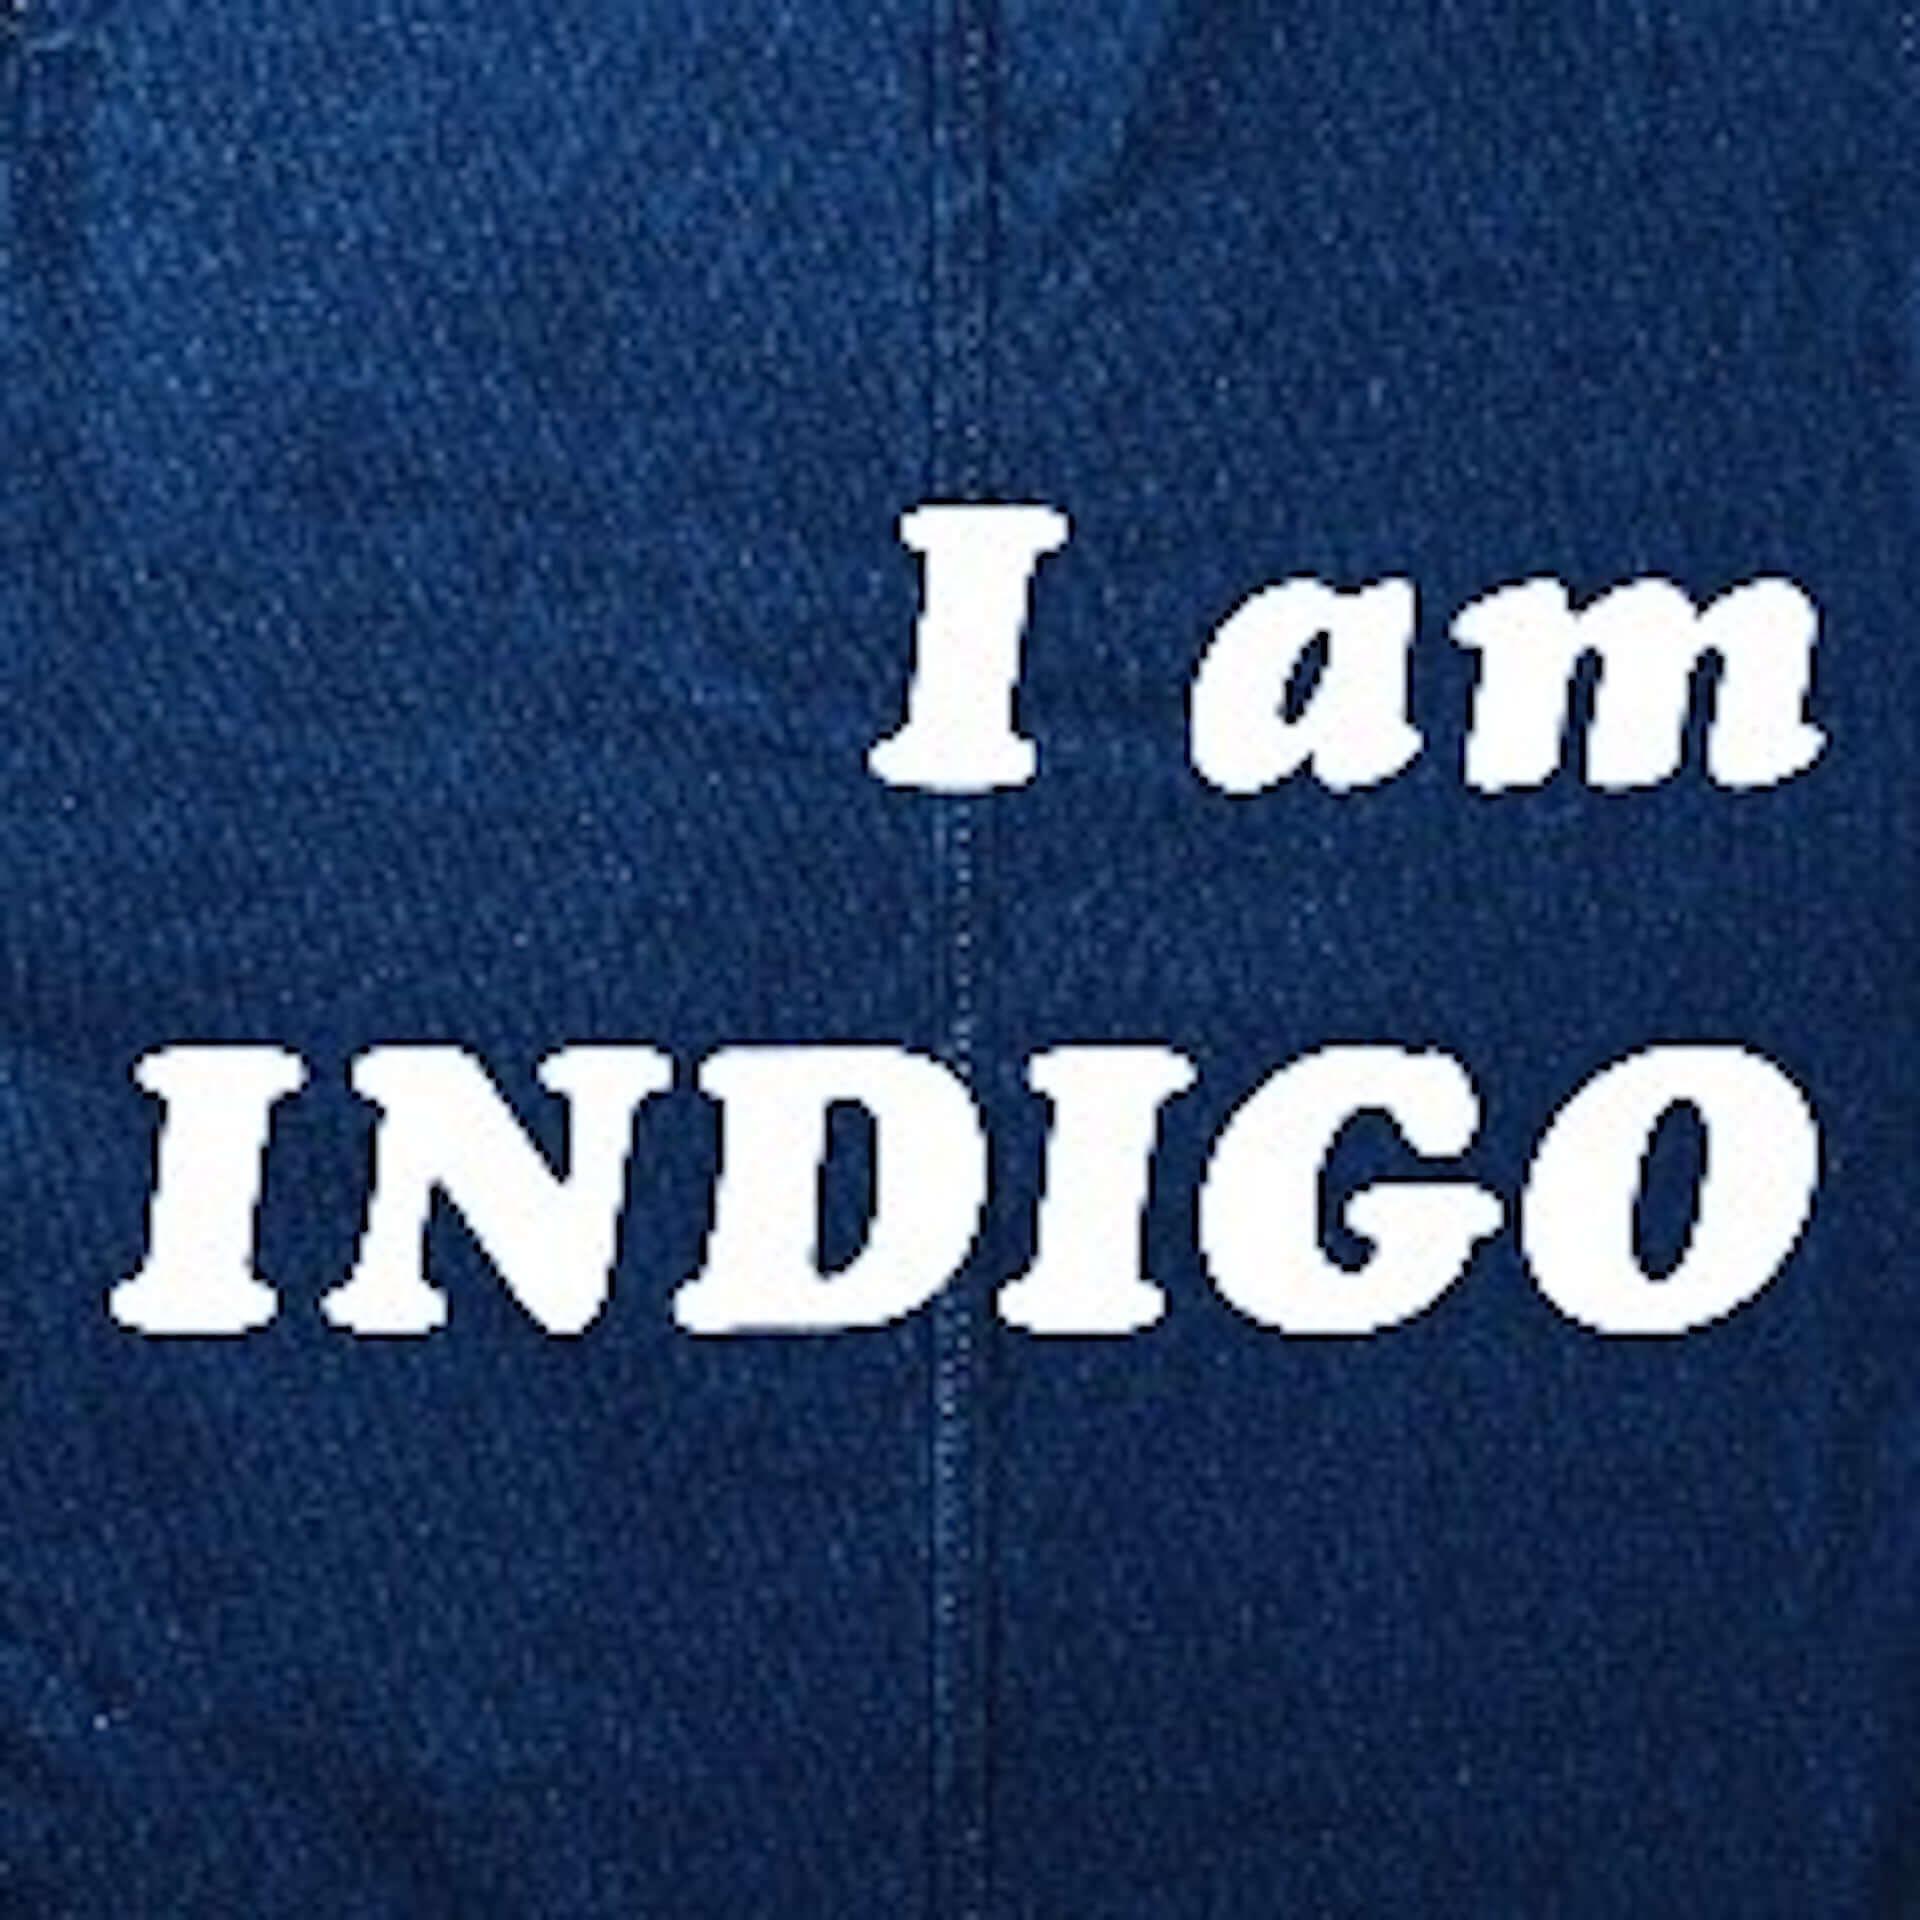 Lee原宿店で今夏注目の天然インディゴ染めTシャツやジャケットが移転1周年記念限定発売! lf200529_lee_indigo_1-1920x1920